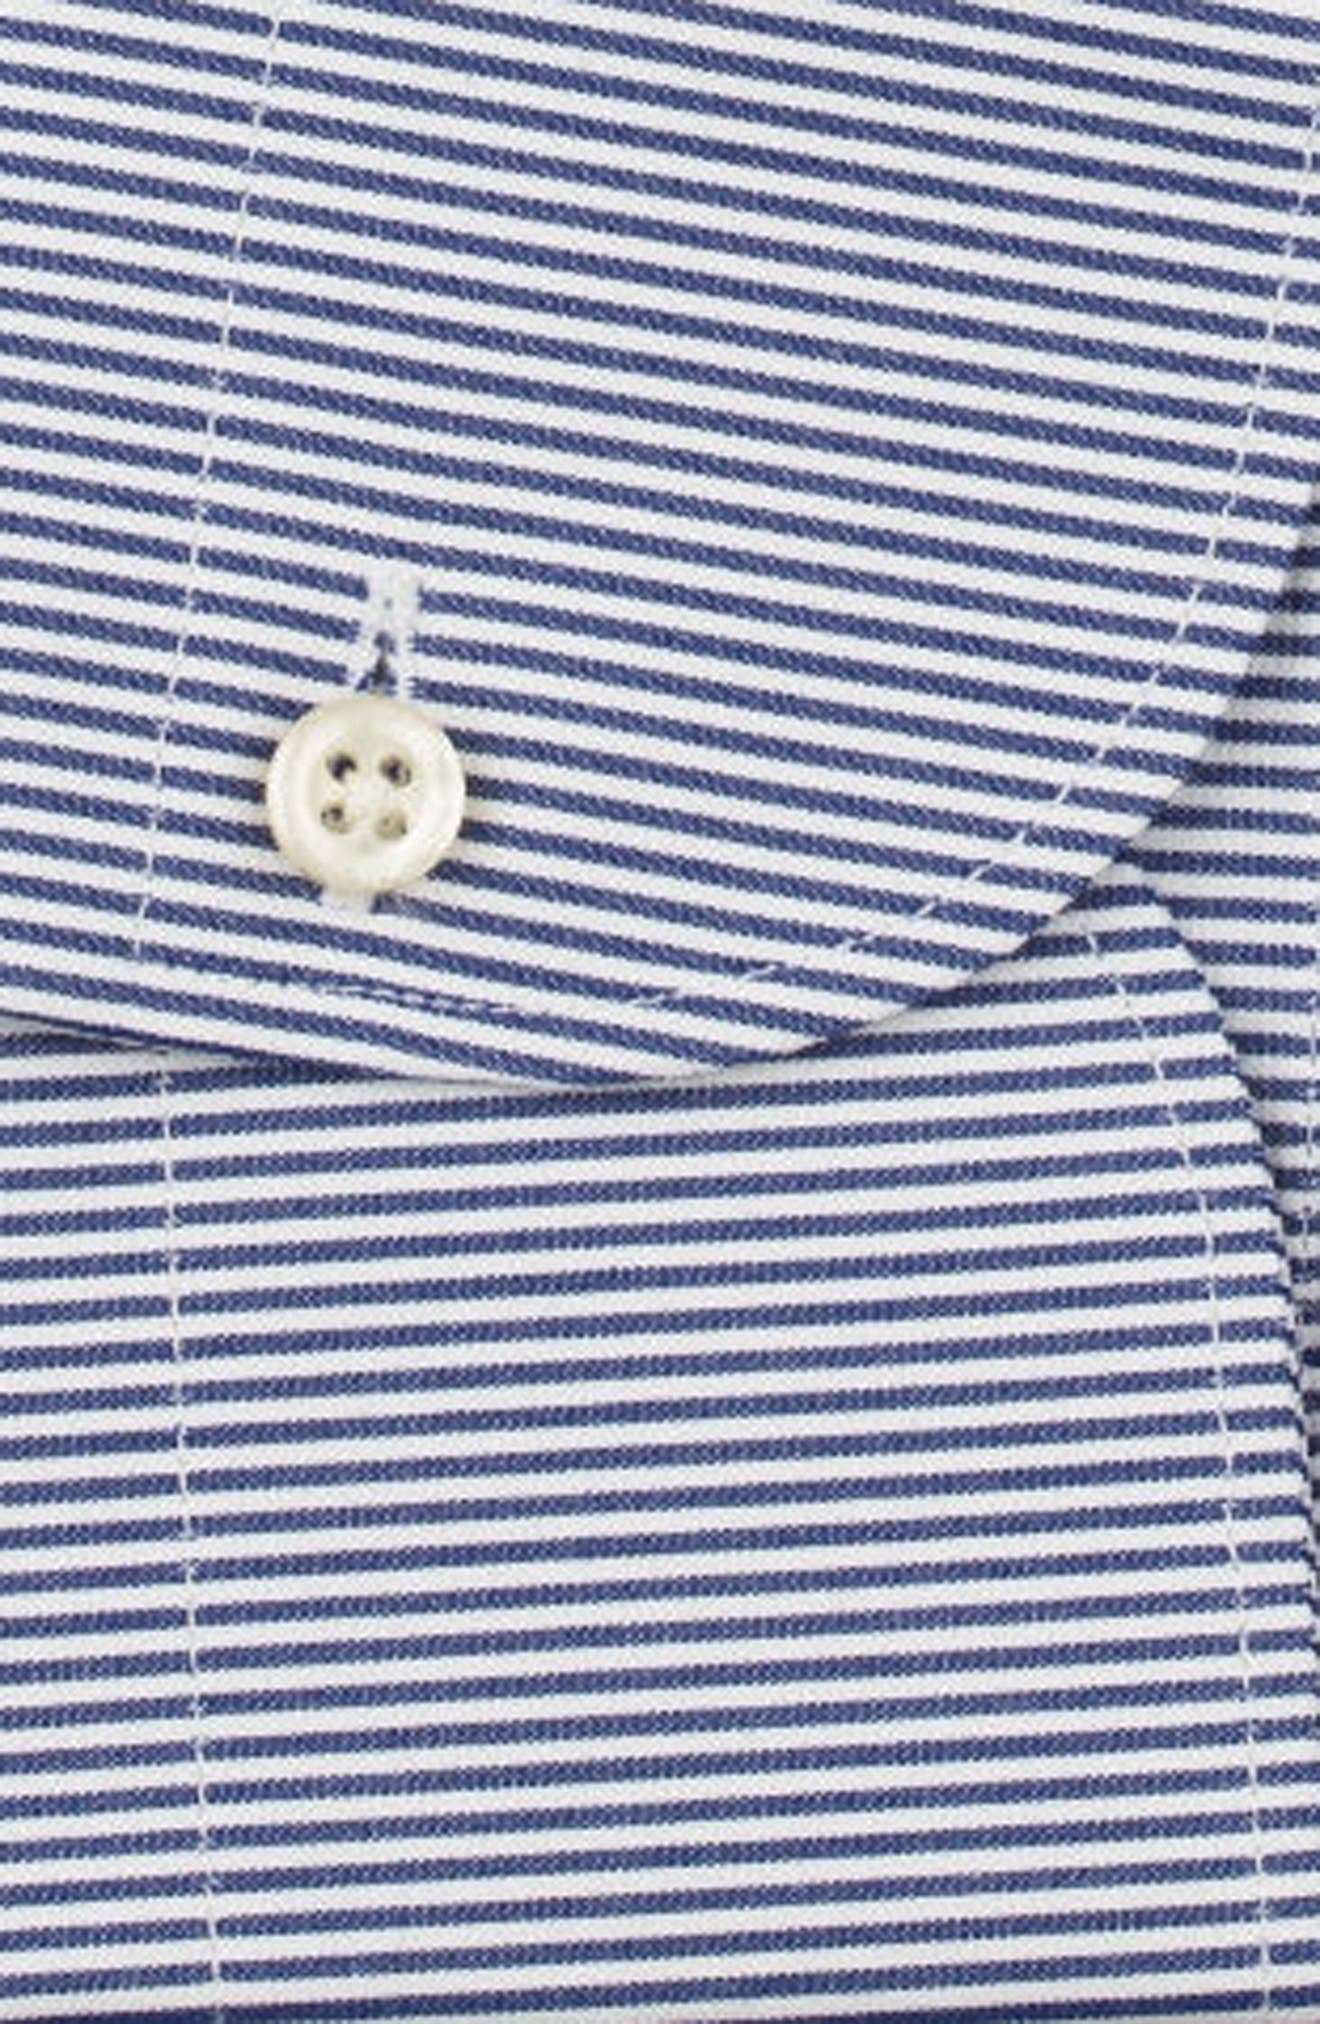 Regular Fit Stripe Dress Shirt,                             Alternate thumbnail 6, color,                             400